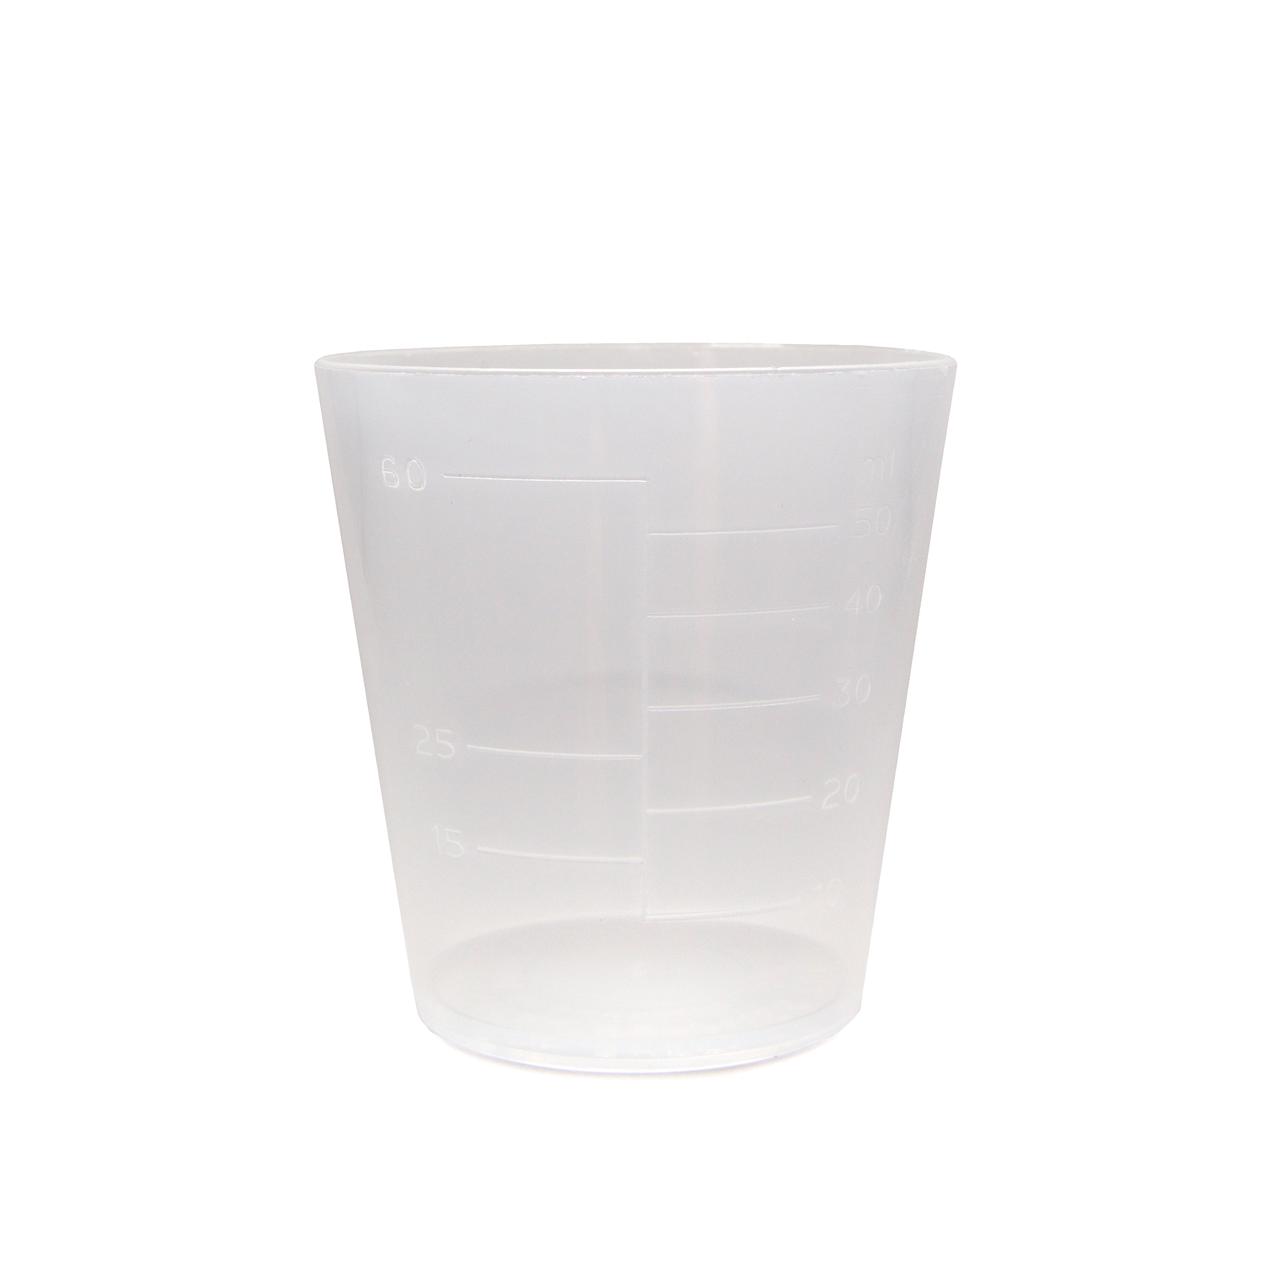 Mixing Cups, Pack of 20 - Bulk Buy